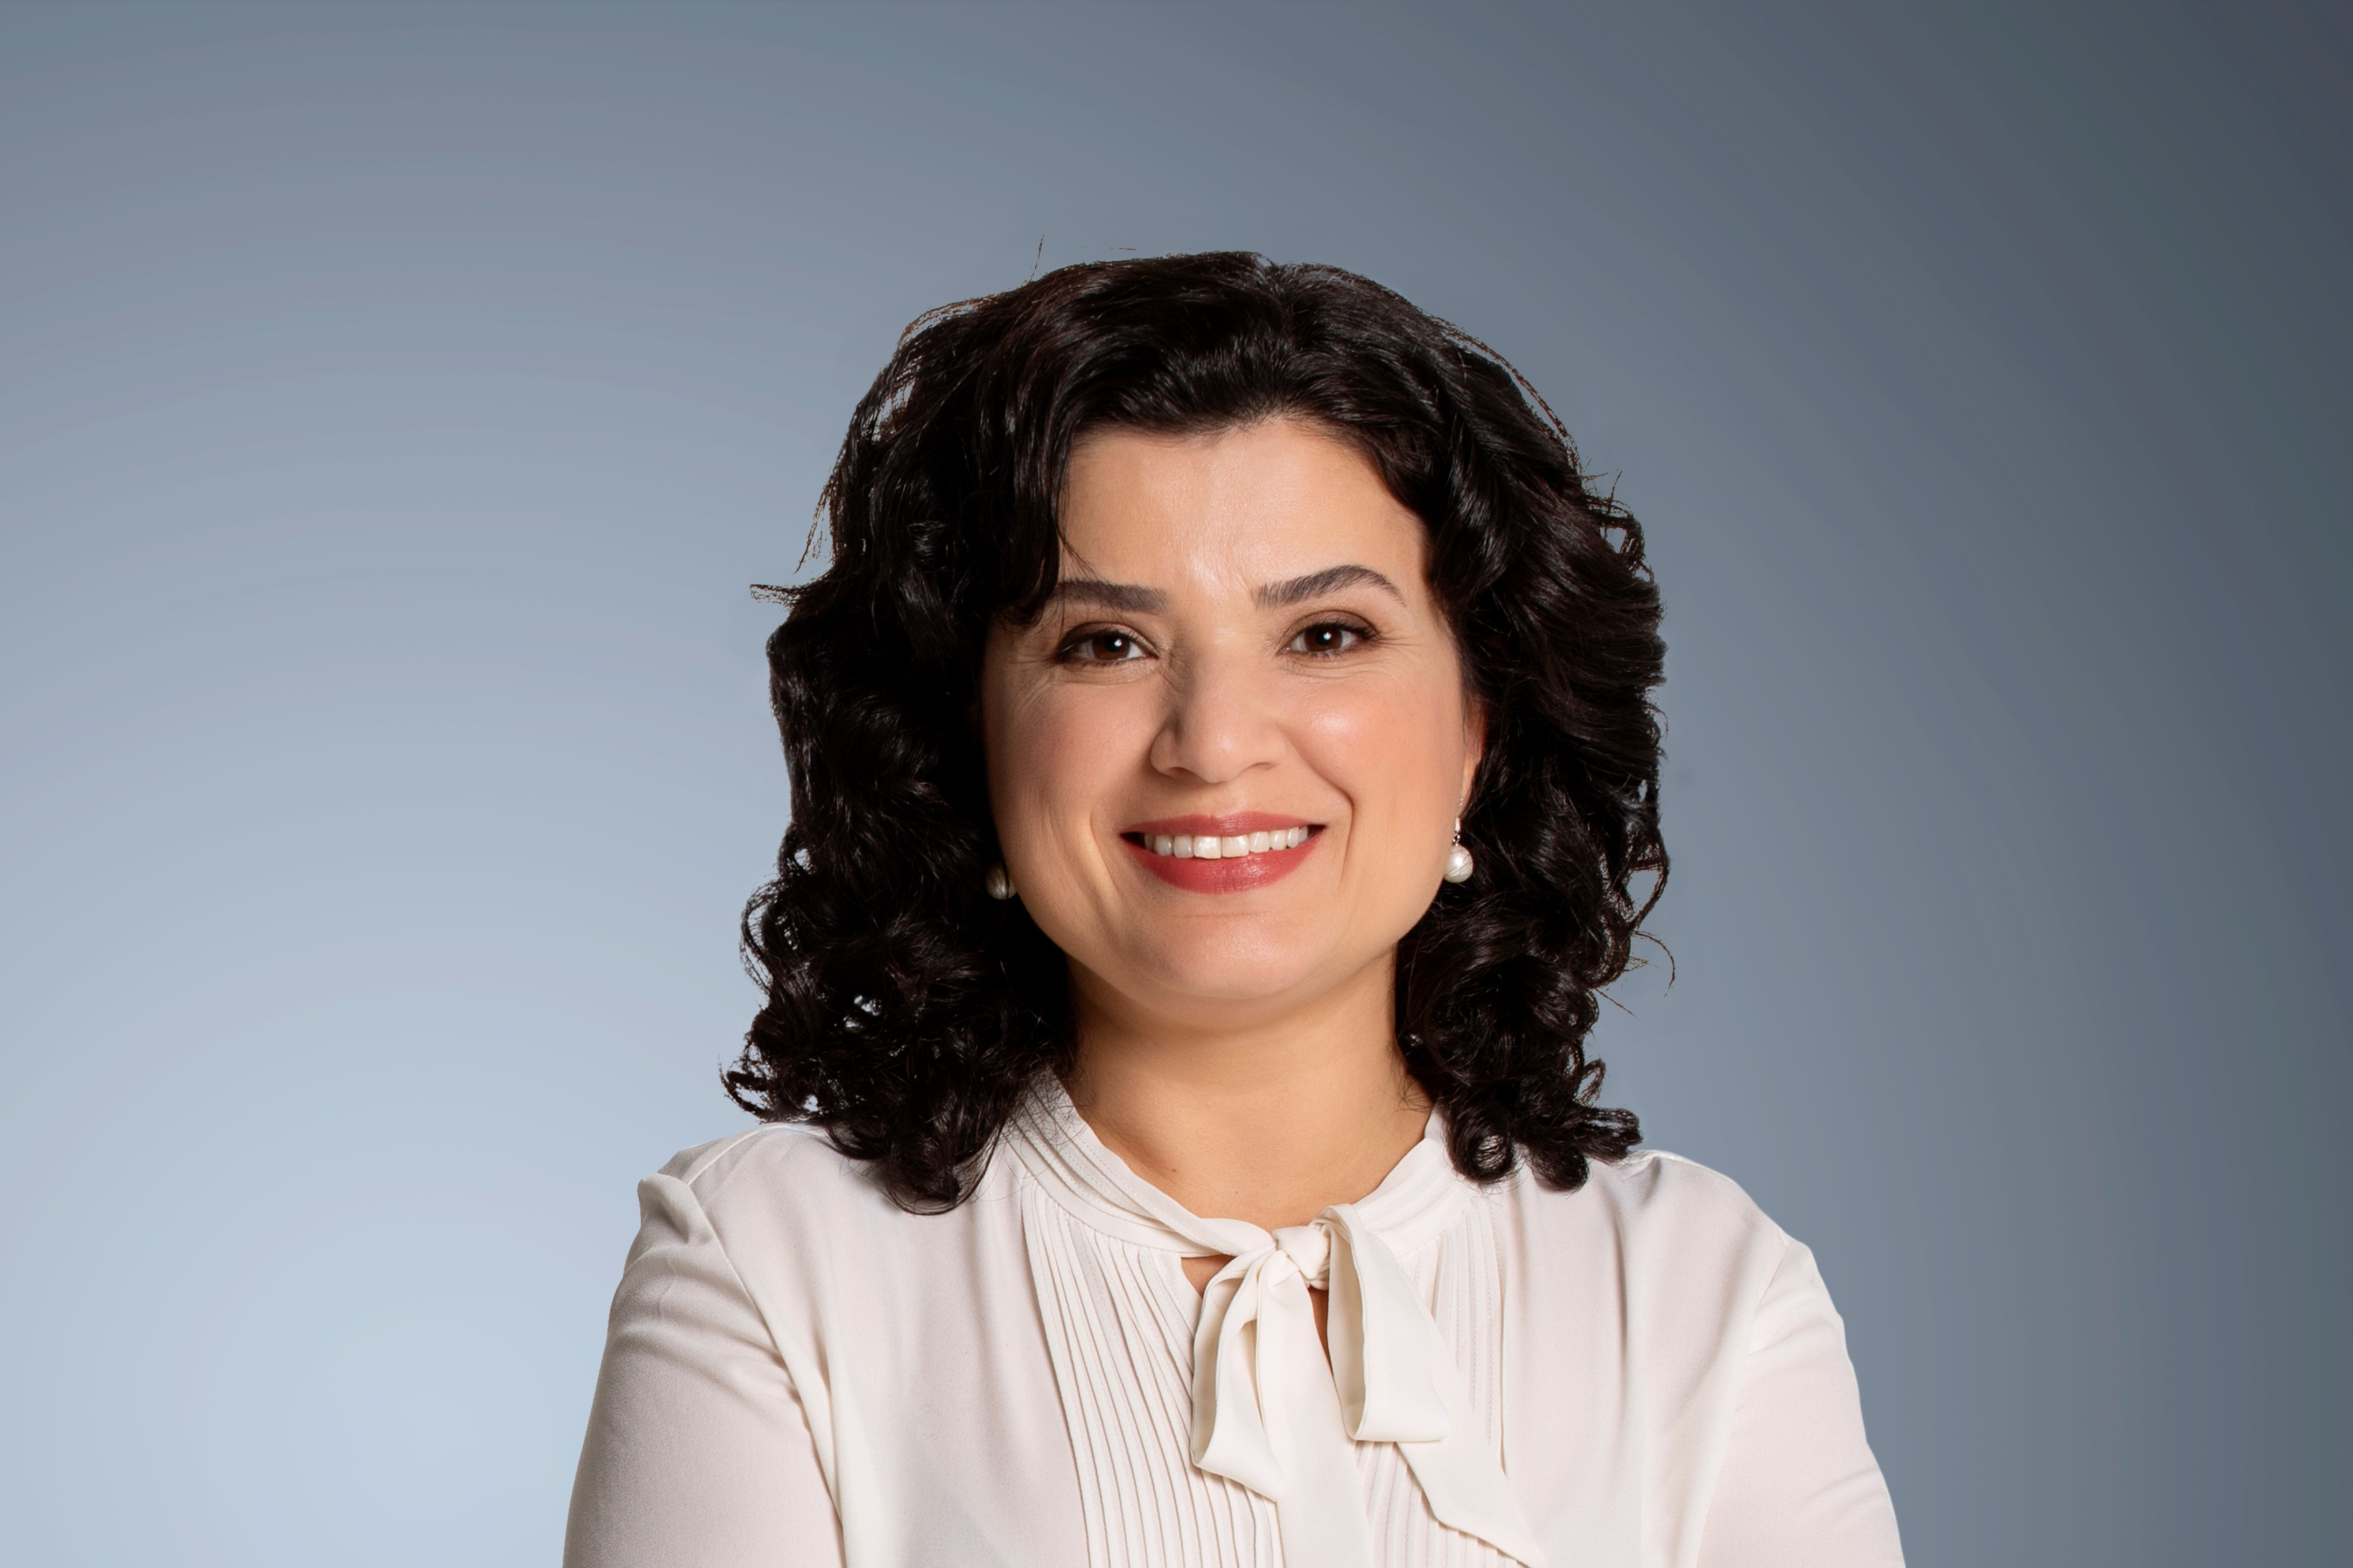 Raquel Landim comentarista e colunista CNN Brasil